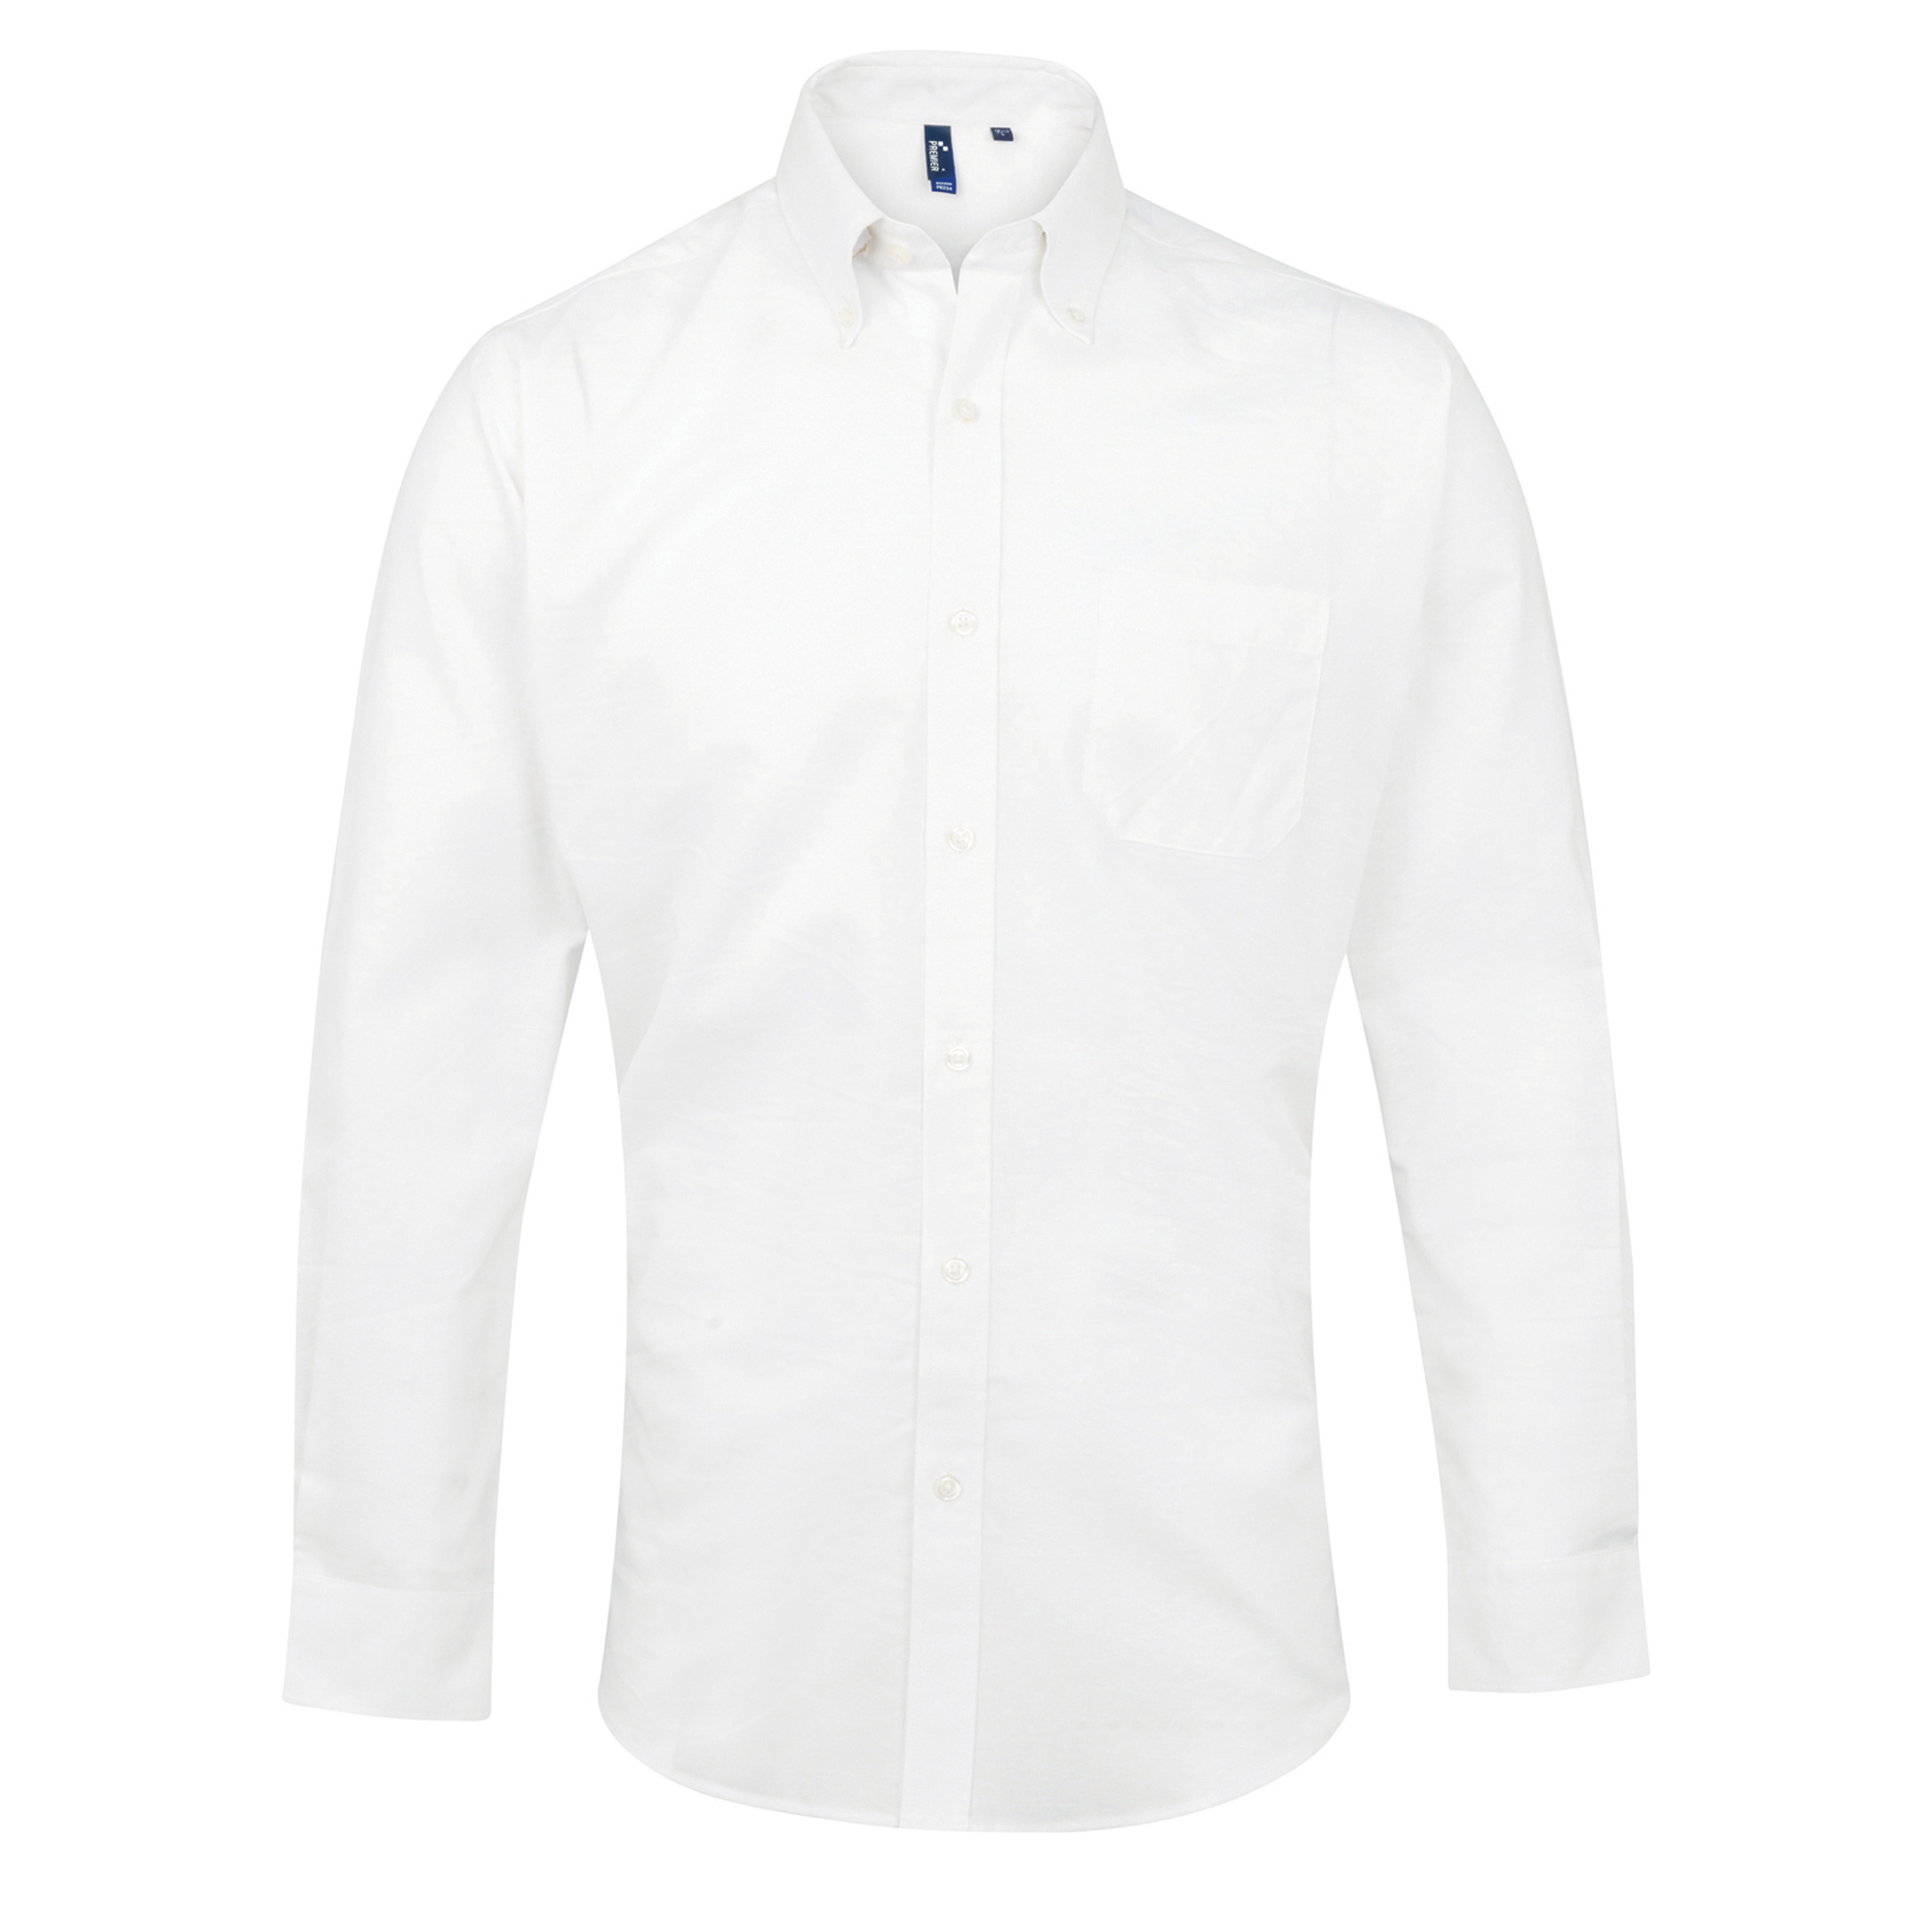 Premier Mens Signature Oxford Long Sleeve Work Shirt (19) (White)